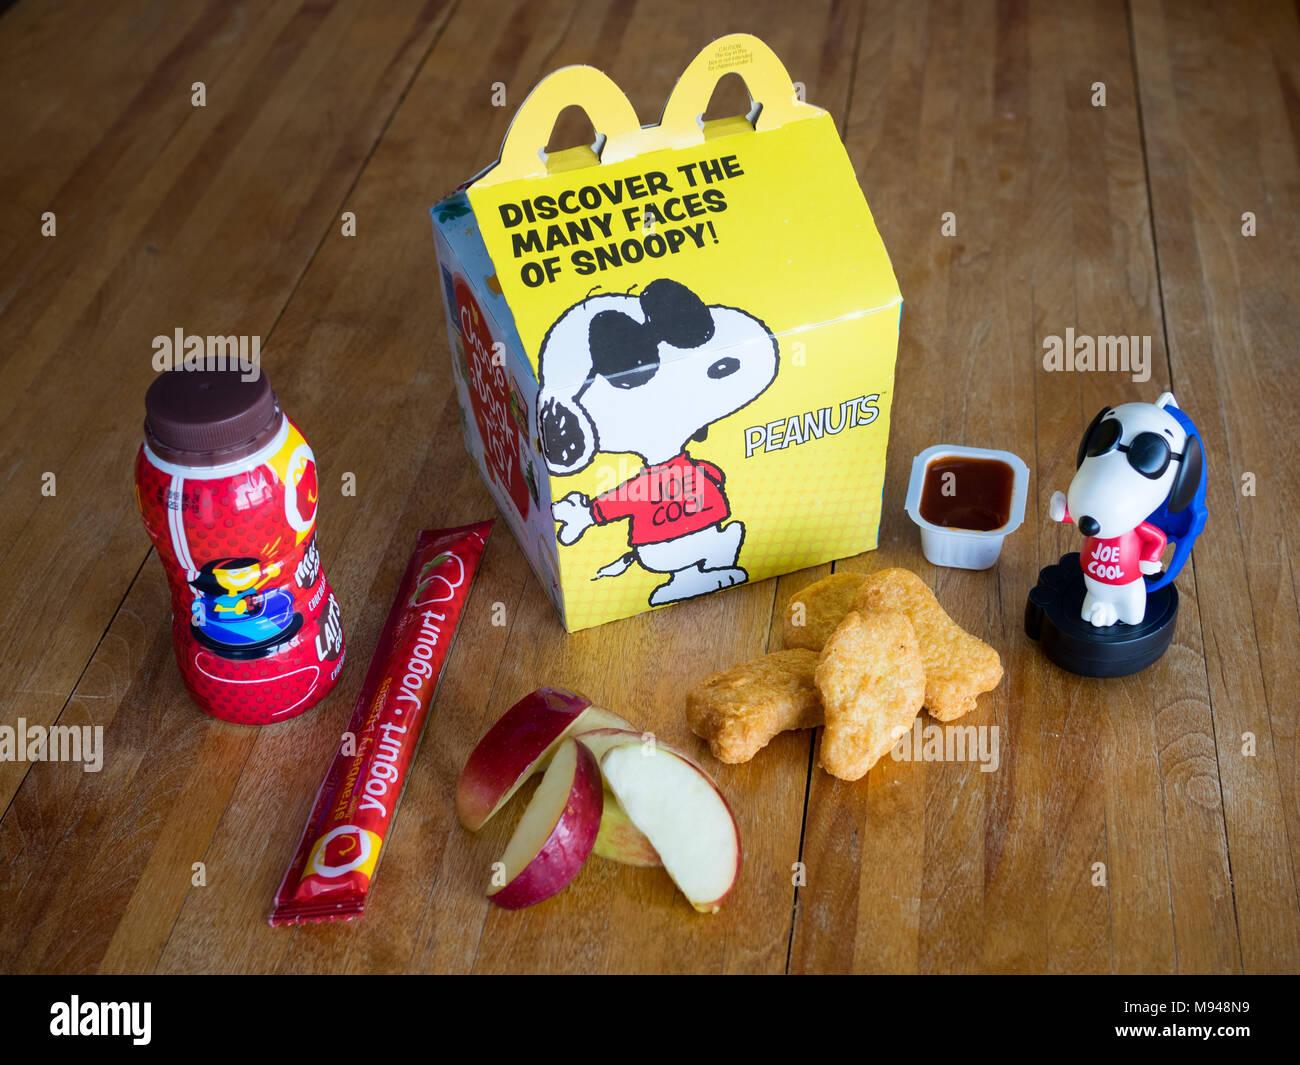 Mcdonalds Mcdonalds Packaging Stock Photos & Mcdonalds ...